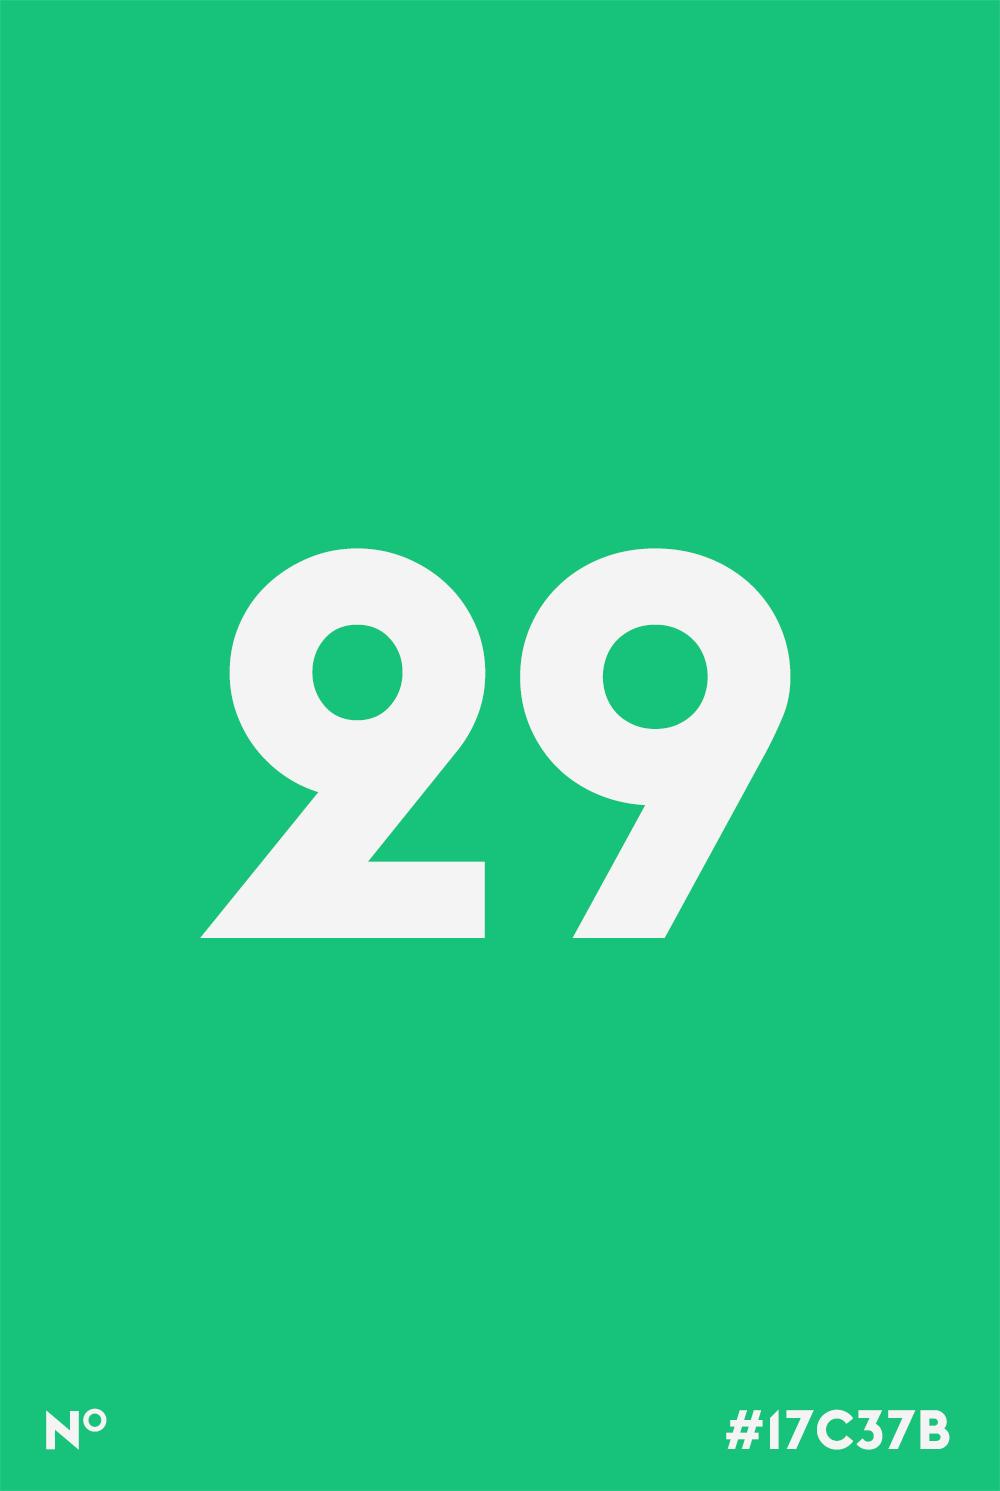 cc_0028_29